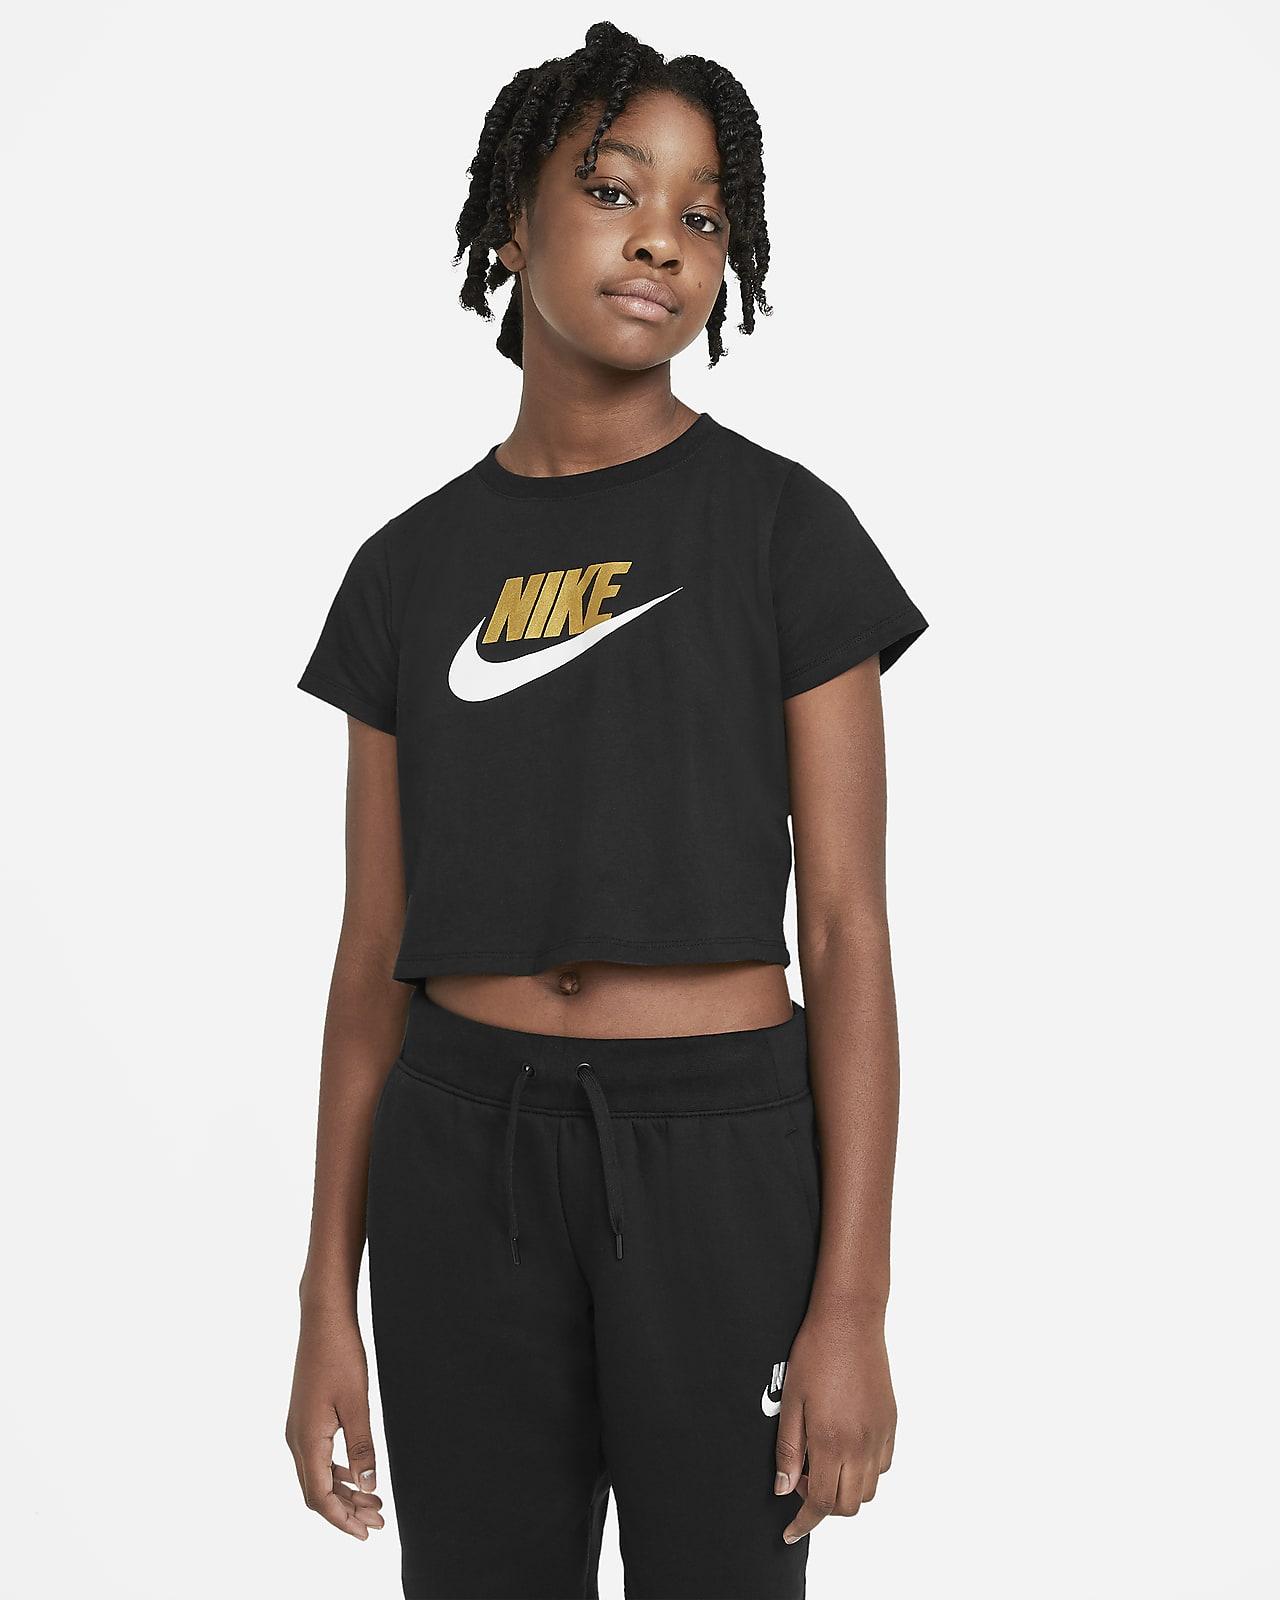 Tee-shirt court Nike Sportswear pour Fille plus âgée